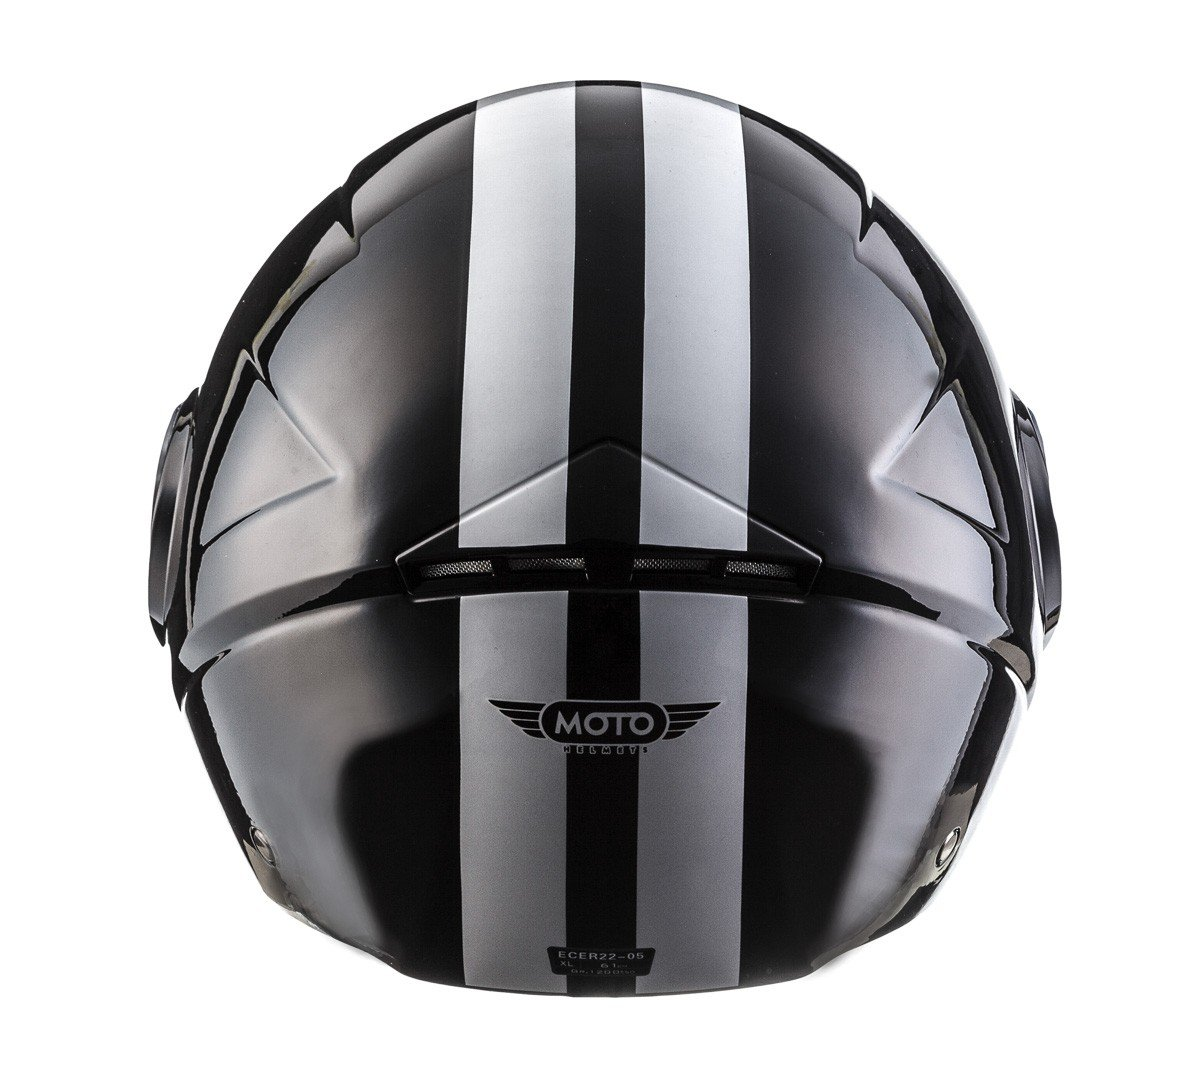 MOTO U52 Matt Black /· Casco Demi-Jet Retro Urbano Cruiser Scooter Vintage Urban Mofa Bobber Biker Moto motocicleta Piloto Helmet Vespa Chopper /· ECE certificado /· visera incluido /· incluyendo bolsa de casco /· Negro /&middo